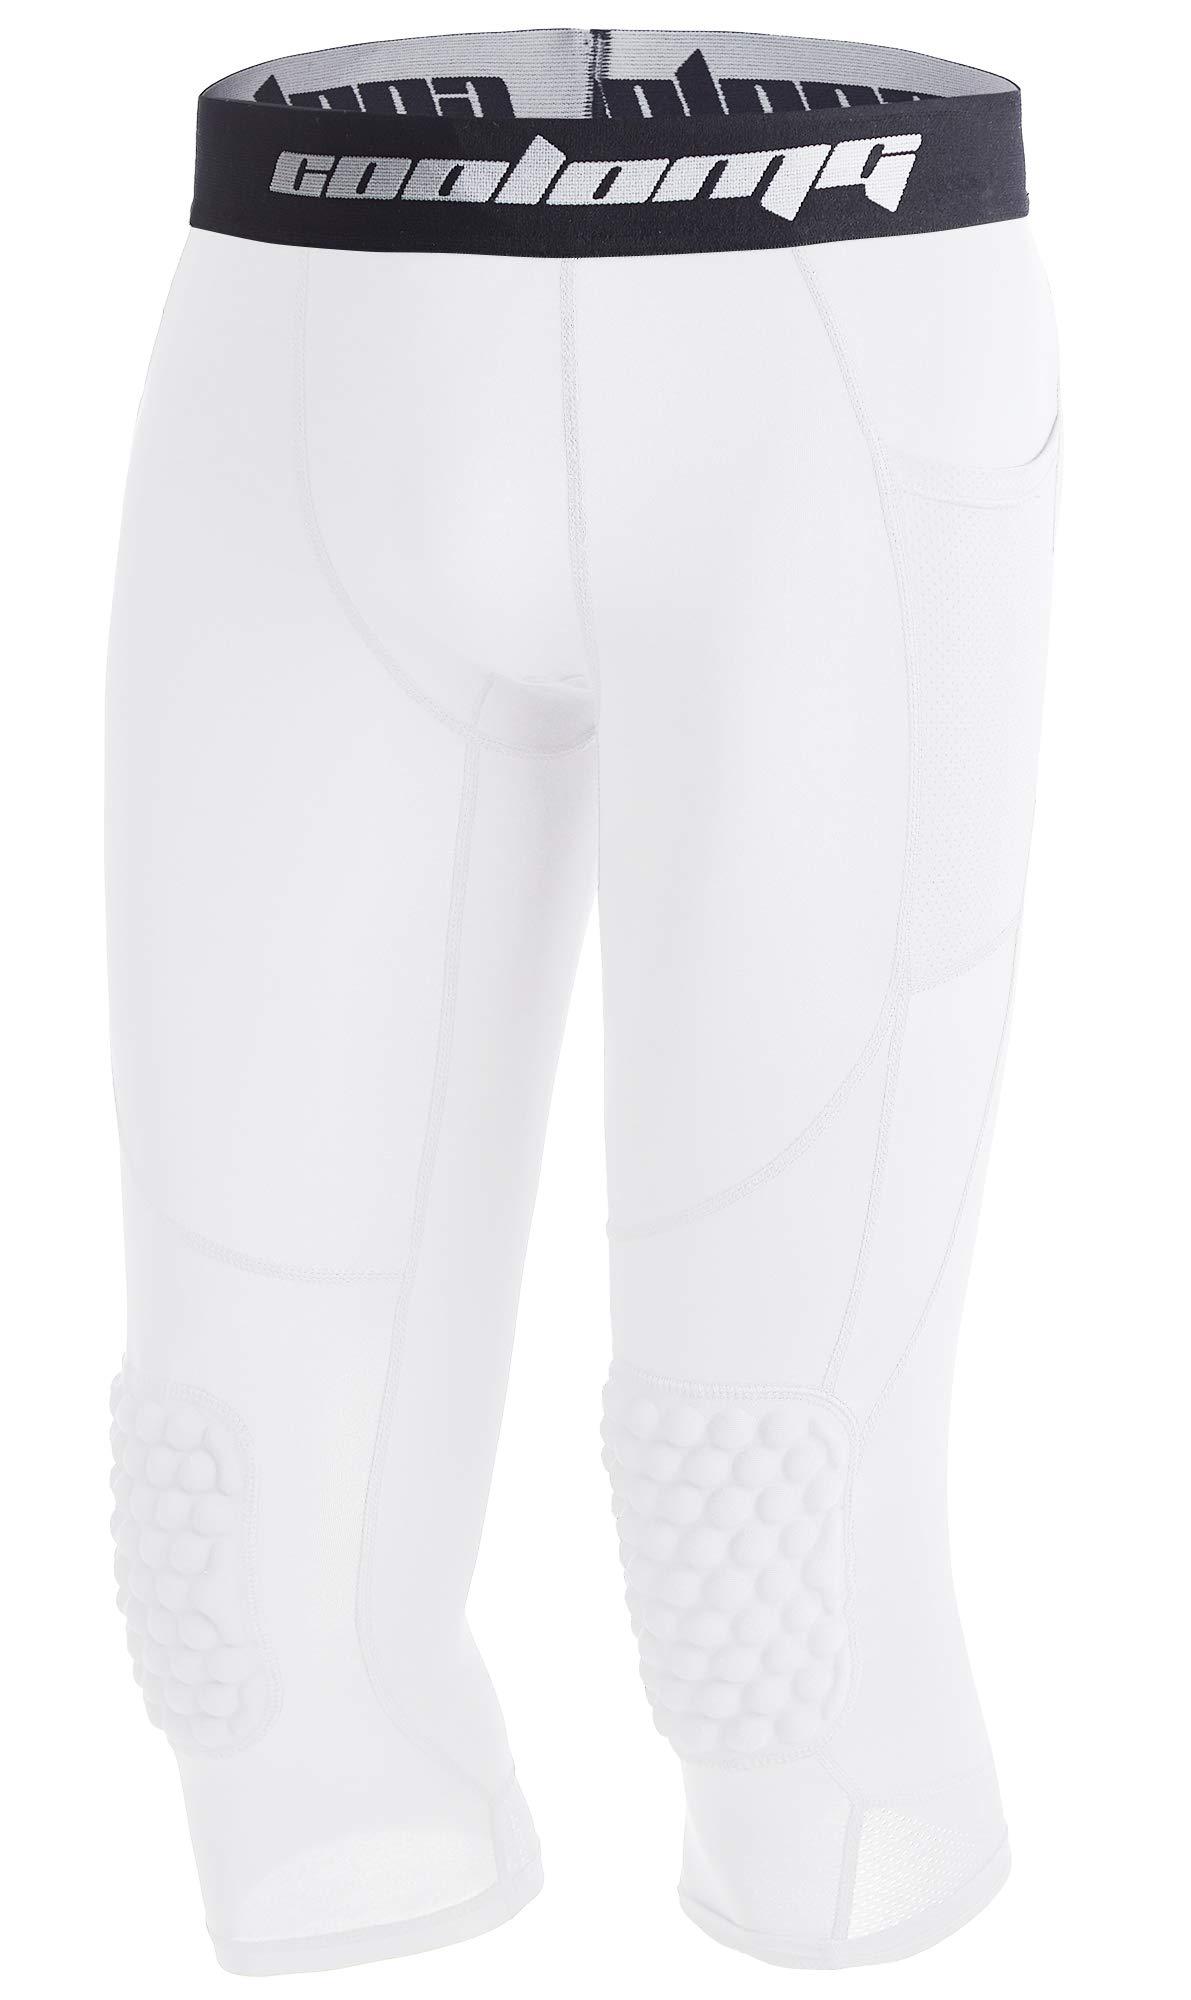 Legendfit Boys Basketball Knee Padded Pants 3/4 Kids Compression Tights Leggings White